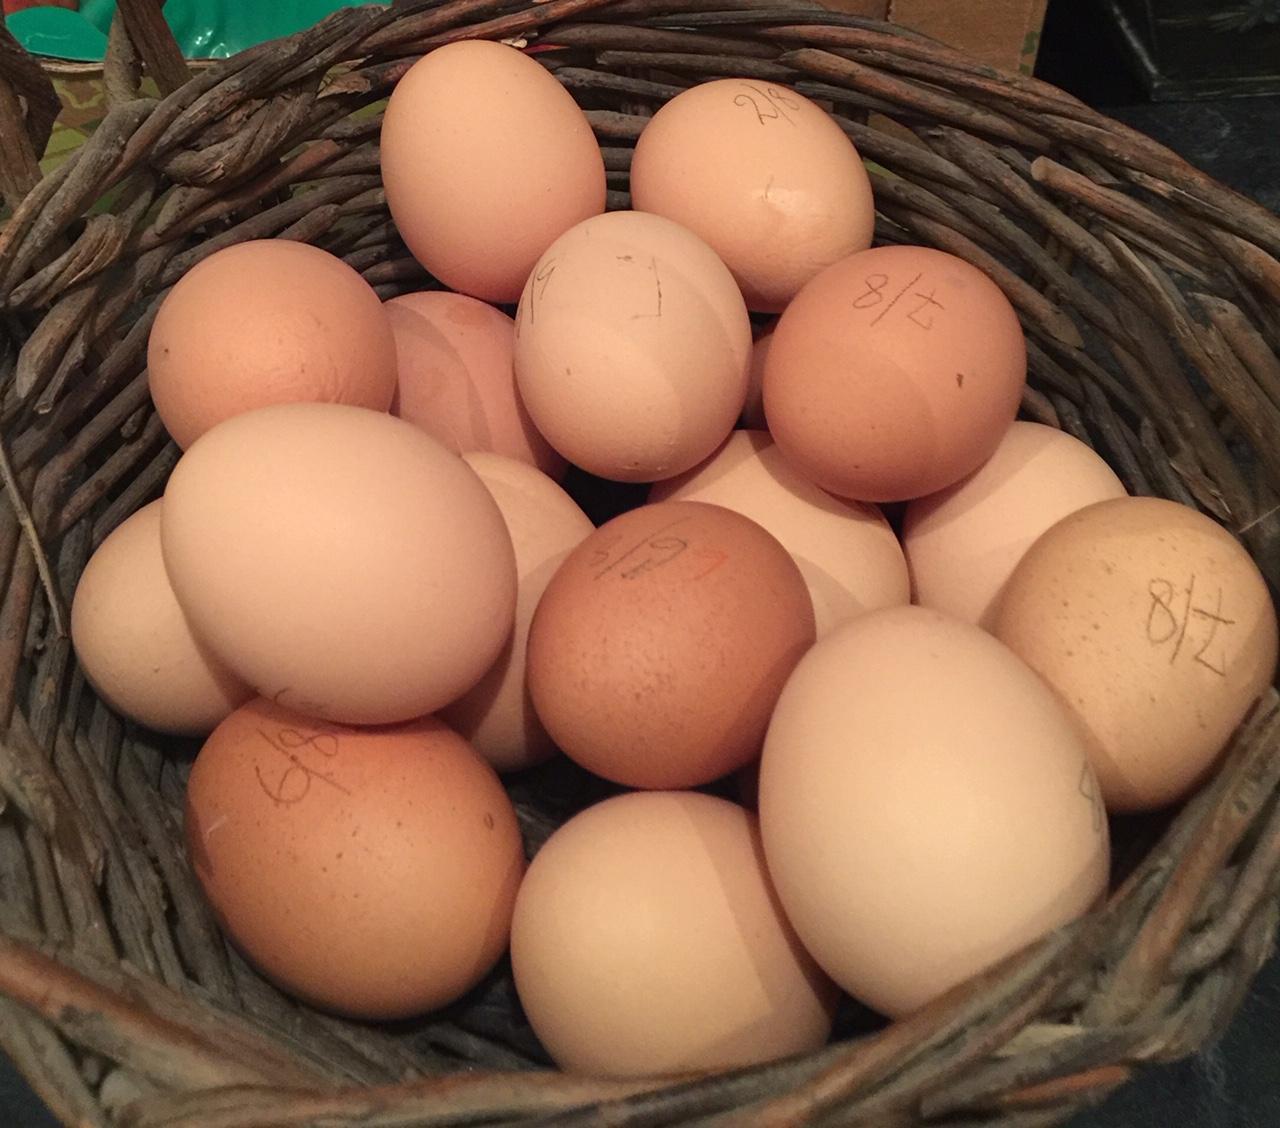 Boite de 6 œufs moyen très frais